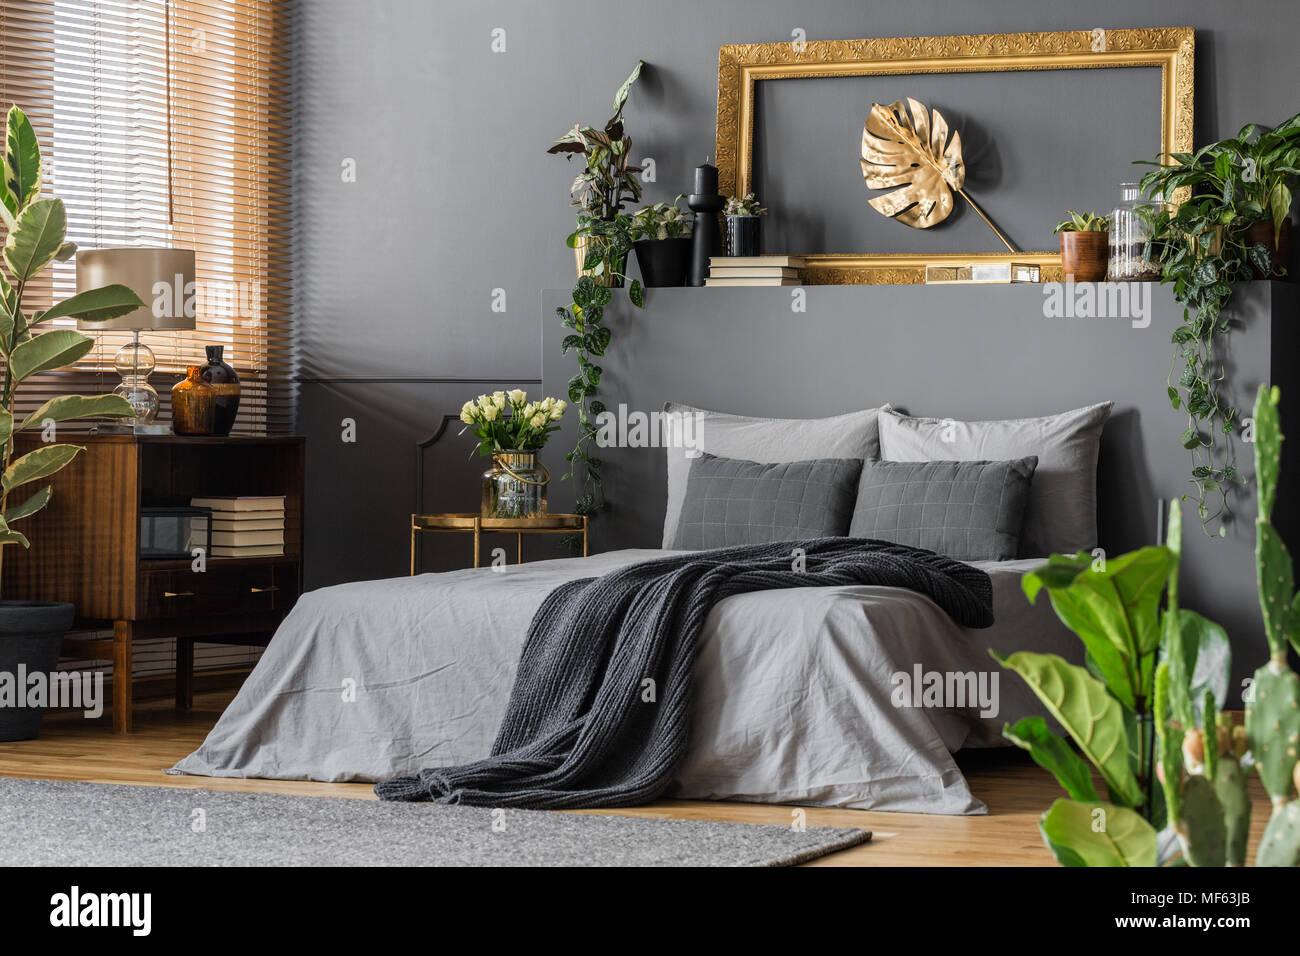 Elegant Frame Black Gold Stockfotos & Elegant Frame Black Gold ...